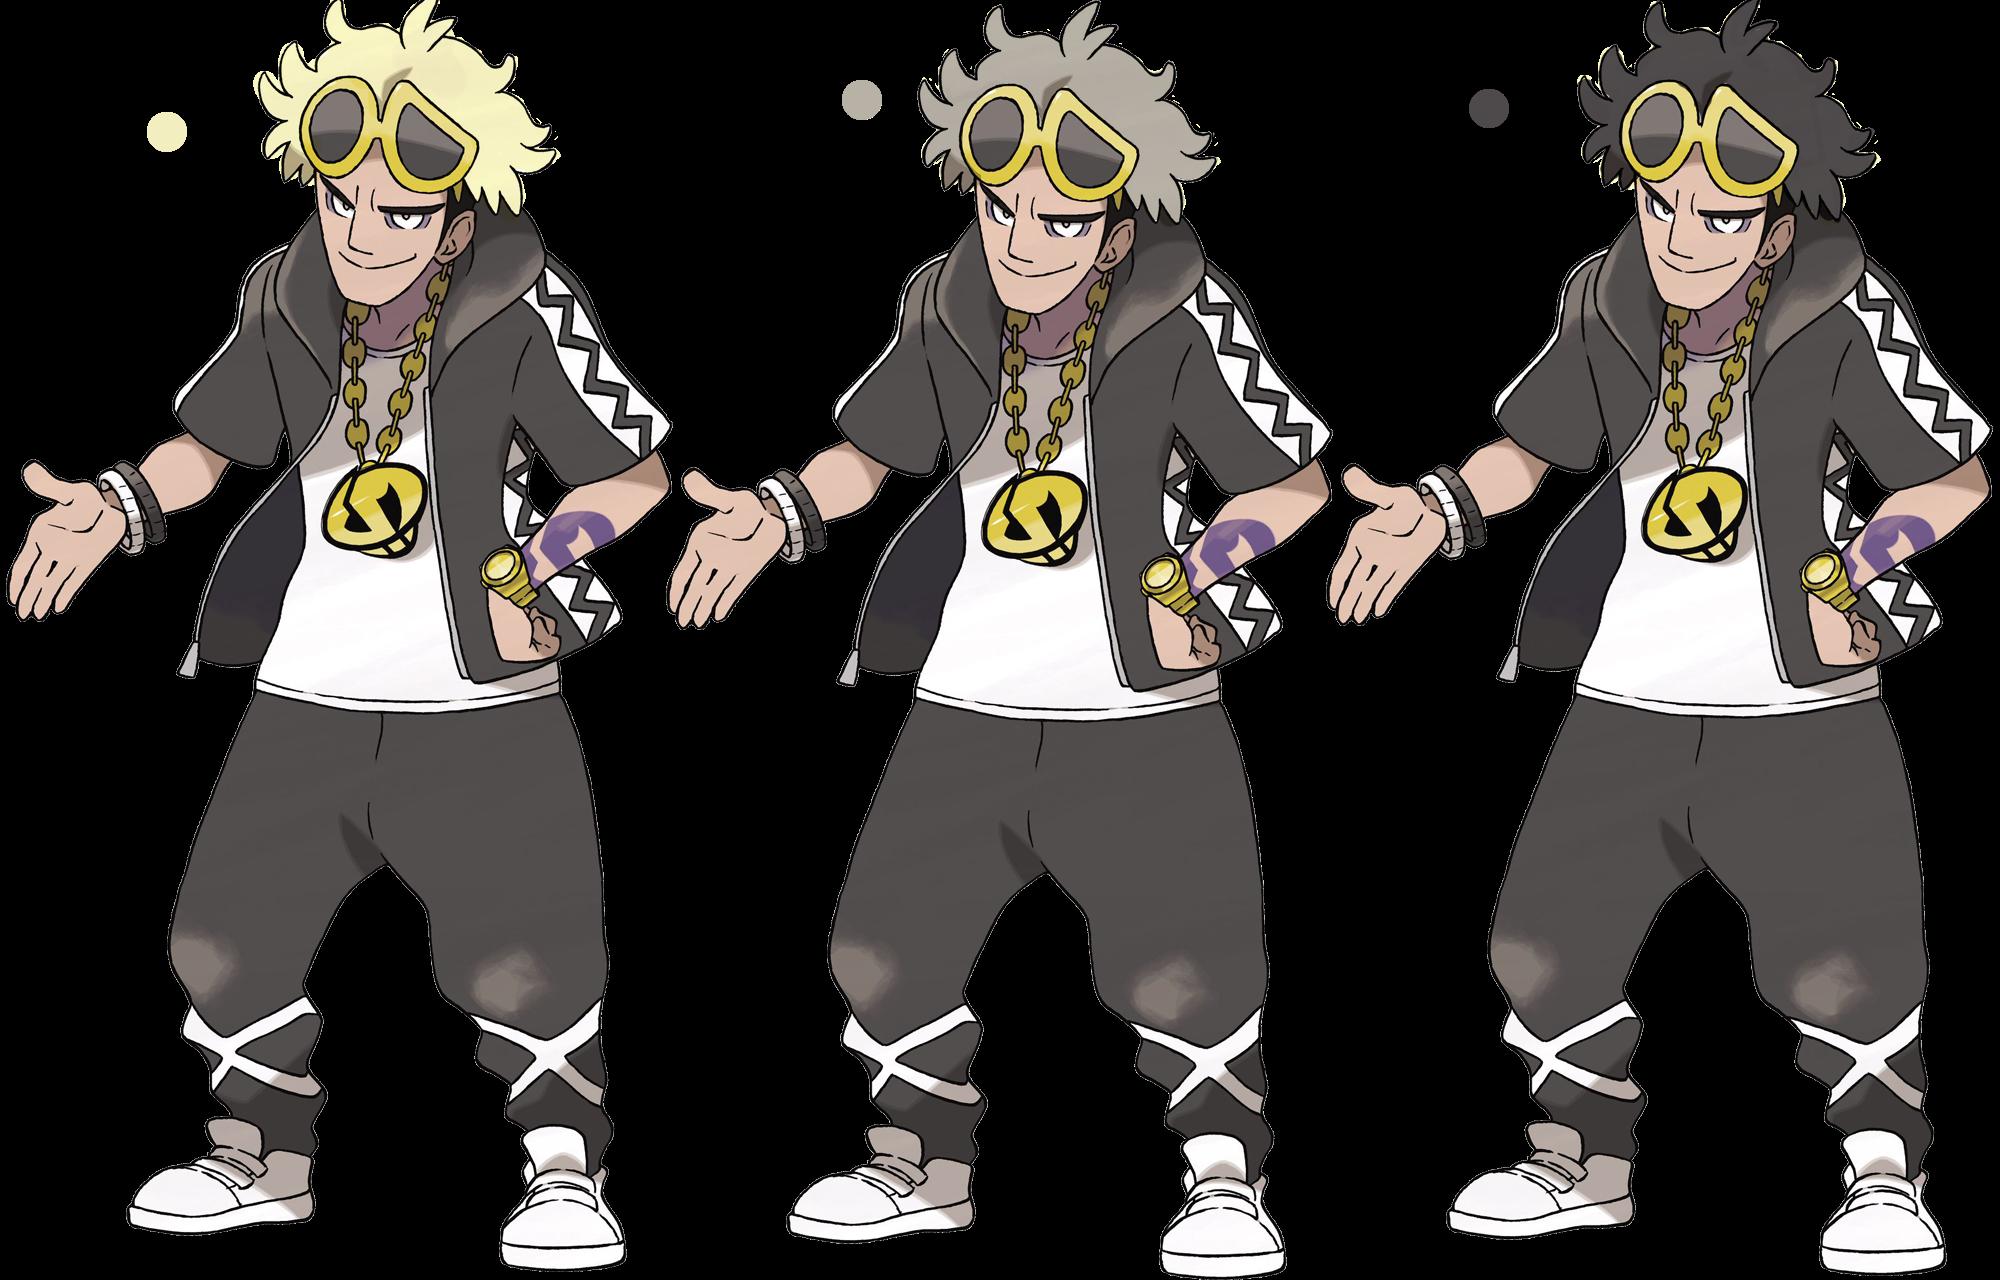 Guzmas Alternate Hair Colors Pokémon Sun And Moon Know Your Meme - Hair colour pokemon x